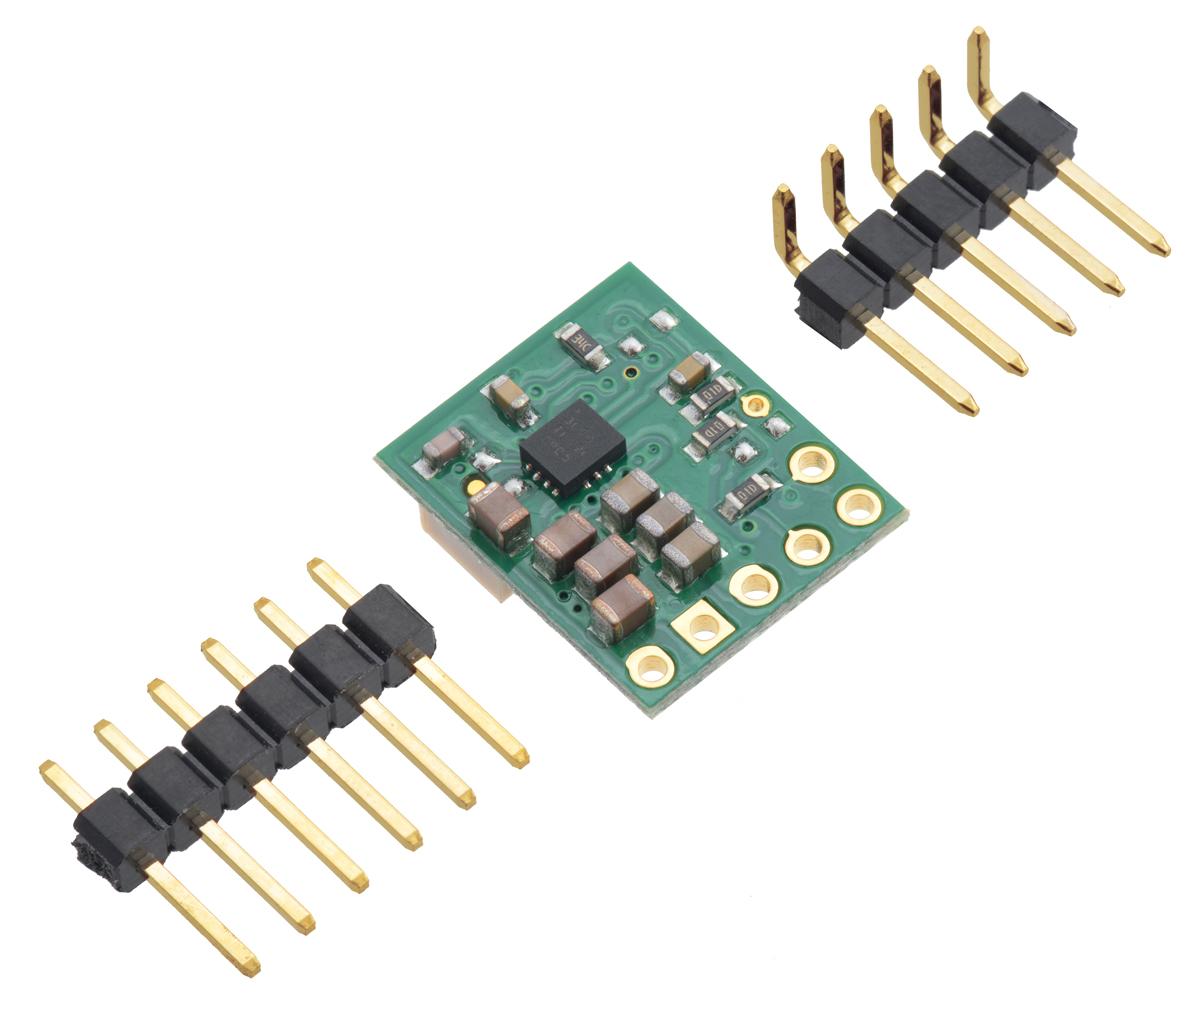 Fastin Faston Flachstecker 3polig Set Kabel Unimog Stecker Komplett Set